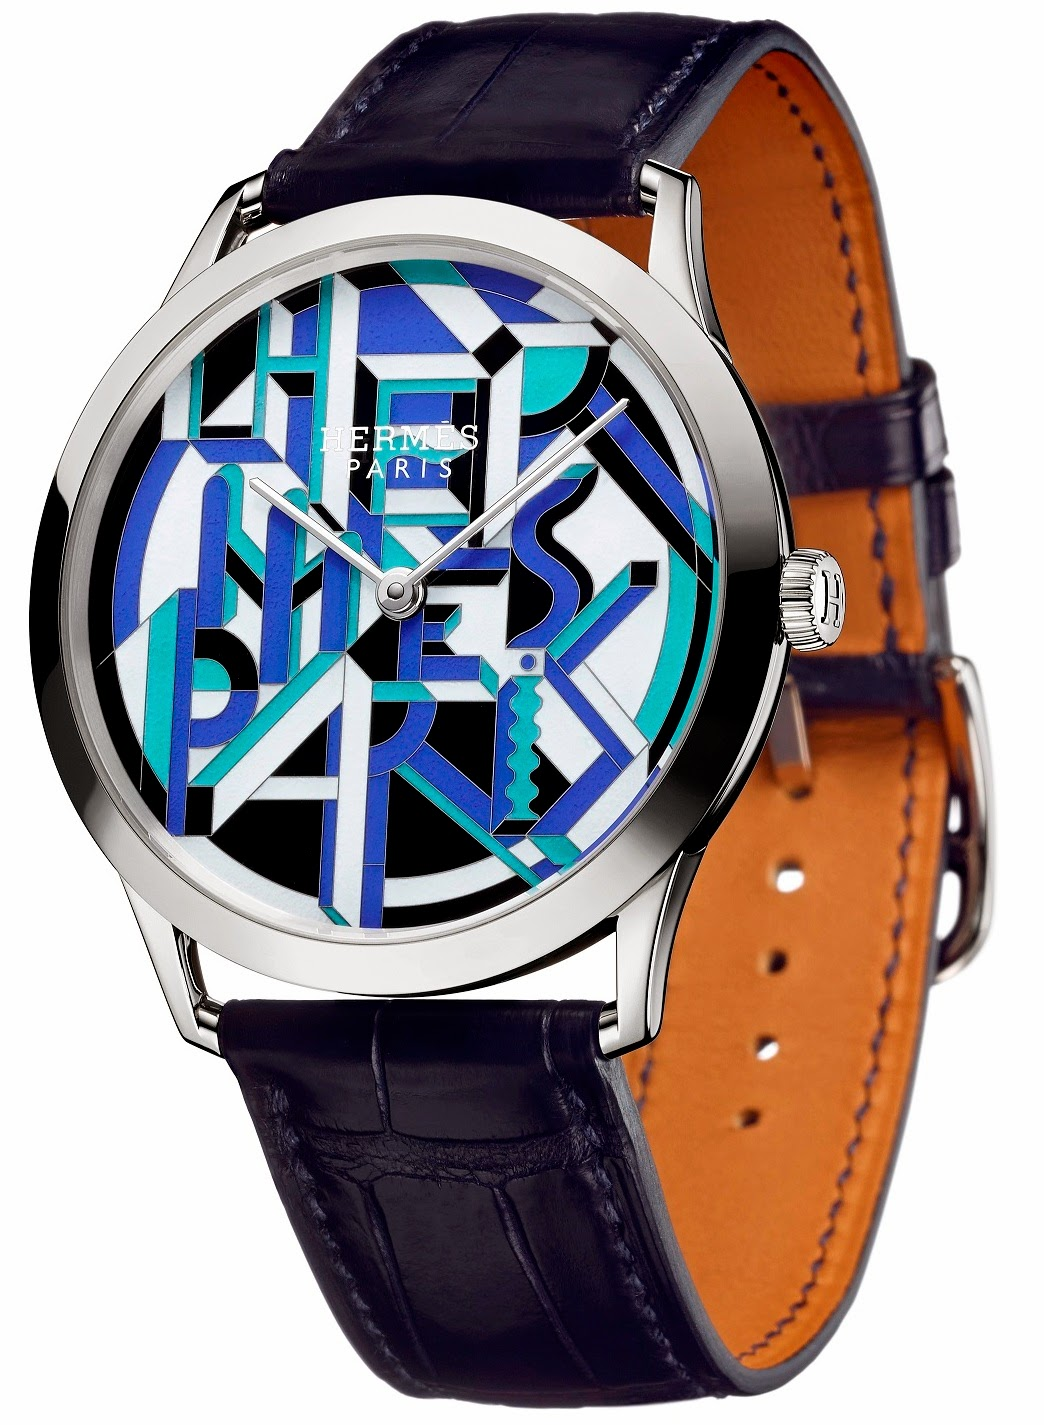 Hermès - Slim d'Hermès Perspective Cavalière watch